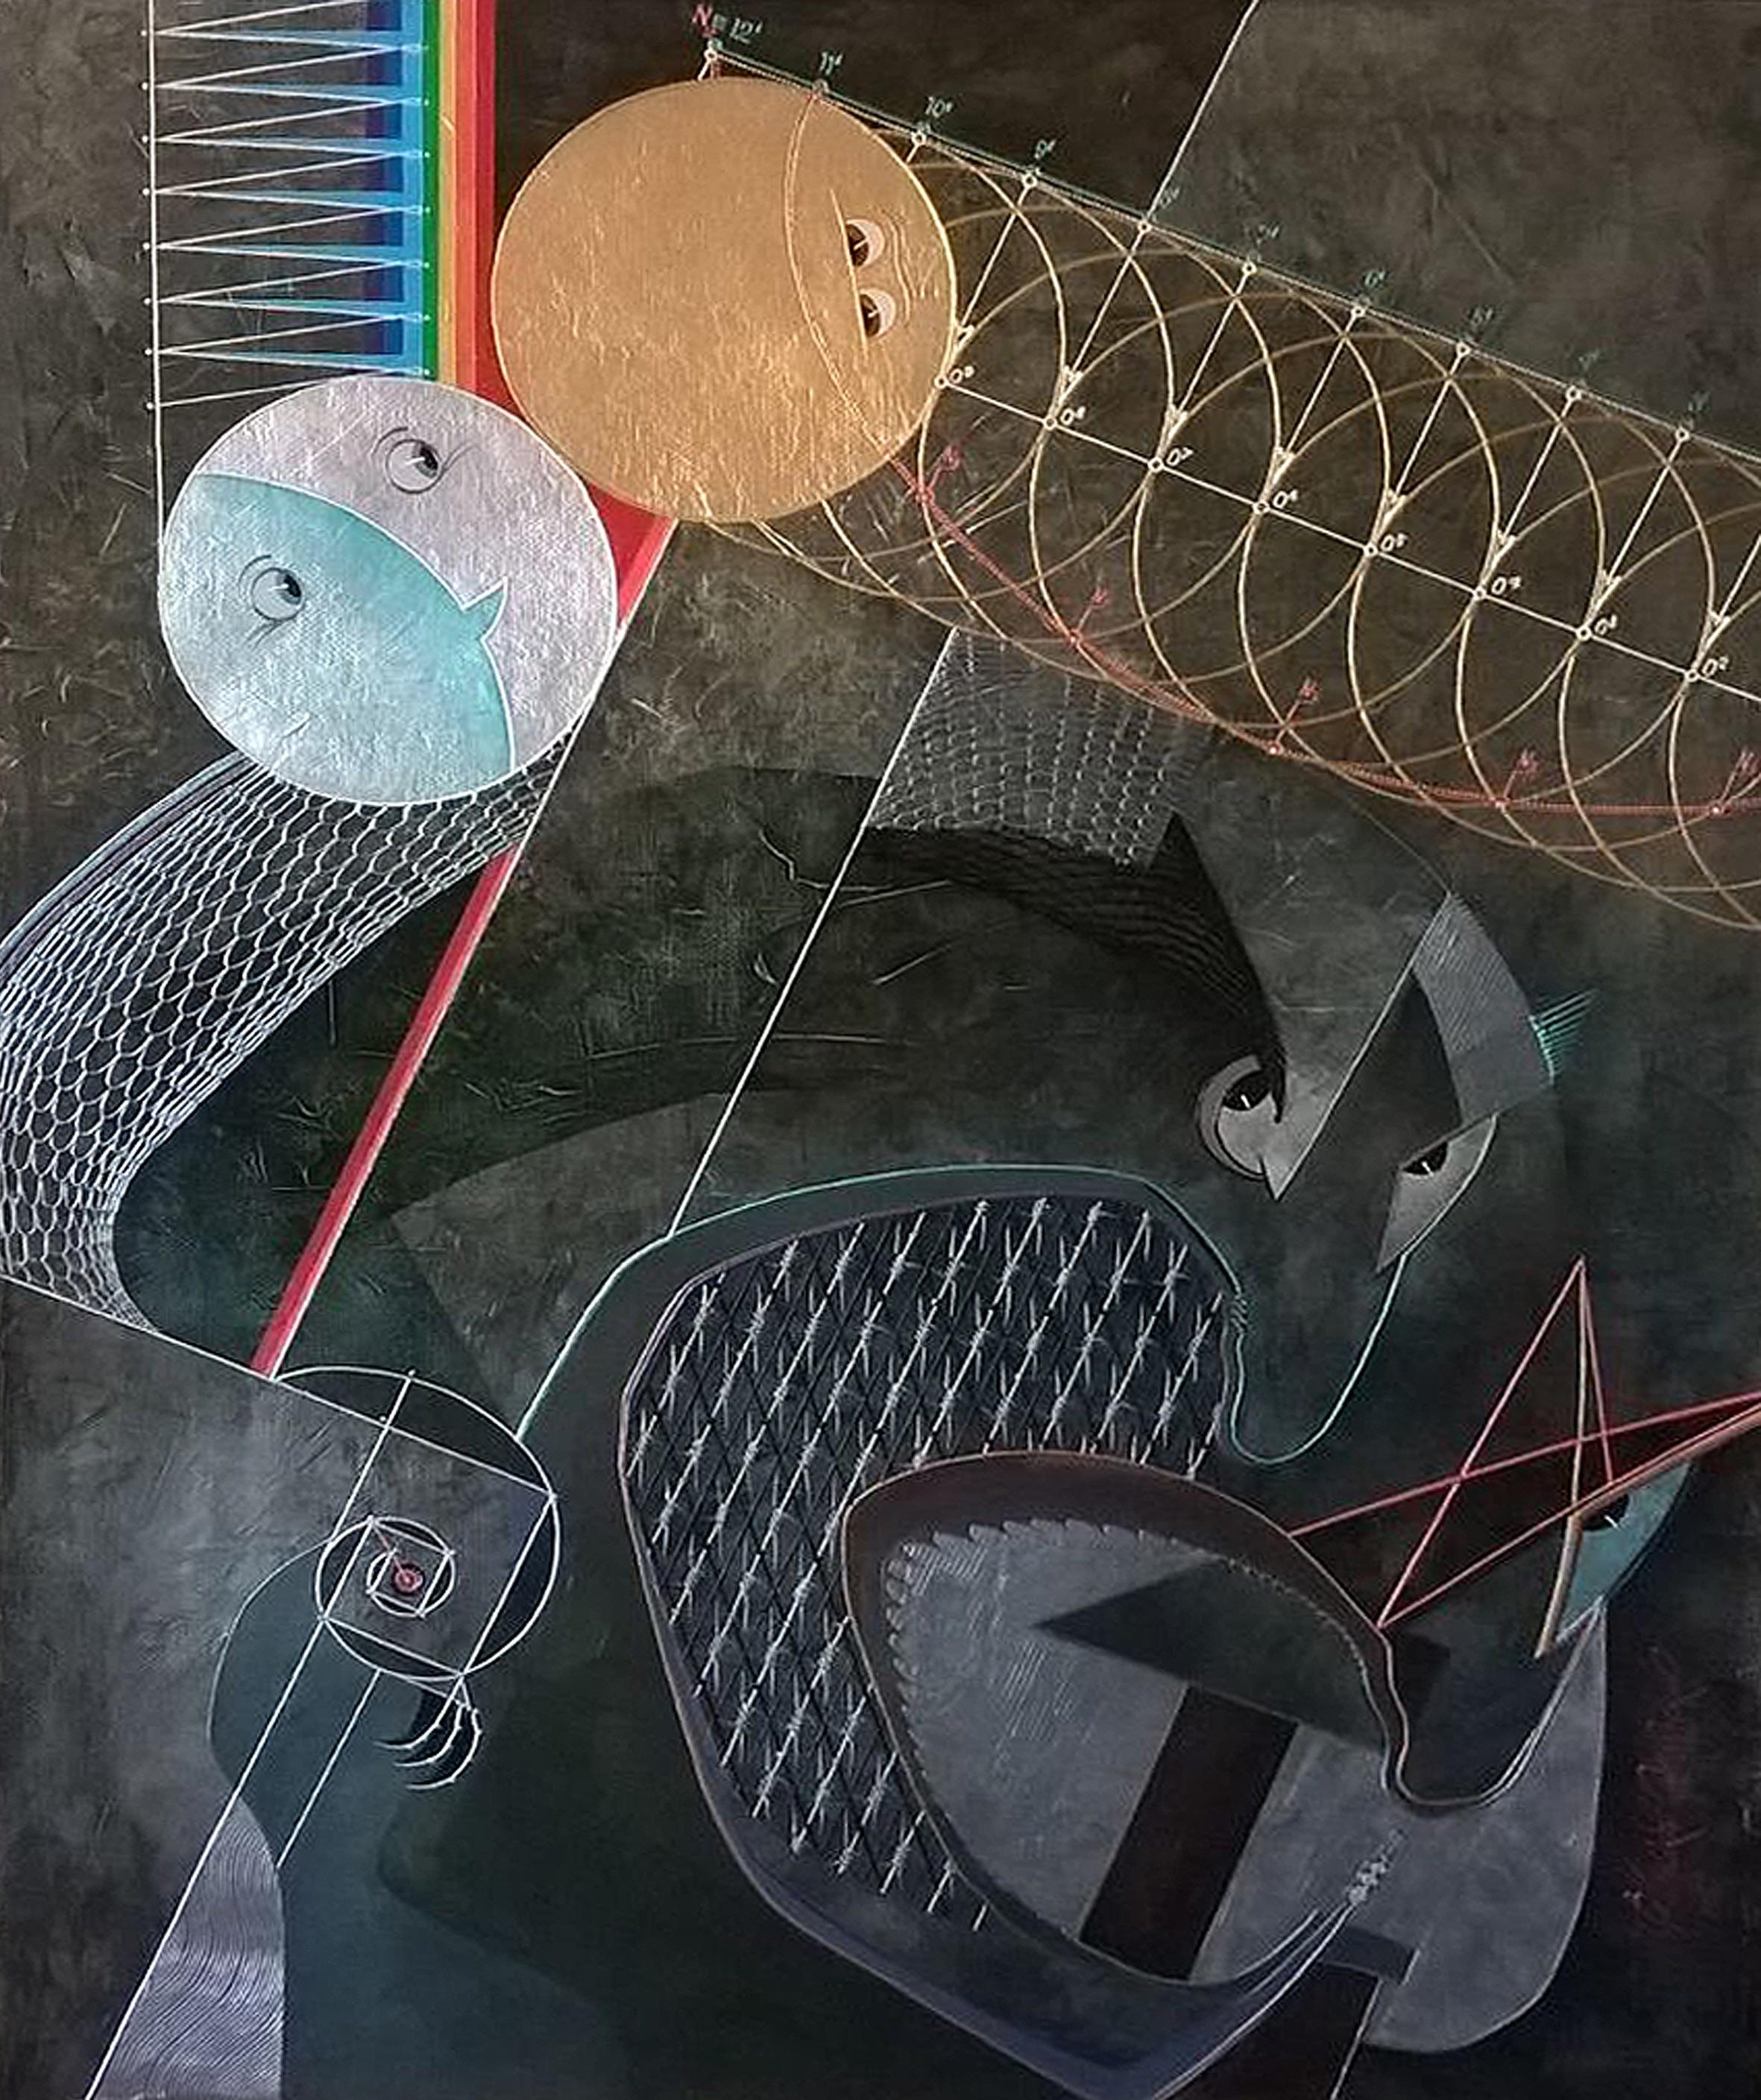 Vladimir Chumakov-Orleansky,  Dusk , 2017, Mischtechnik auf Leinwand, 90x70 cm